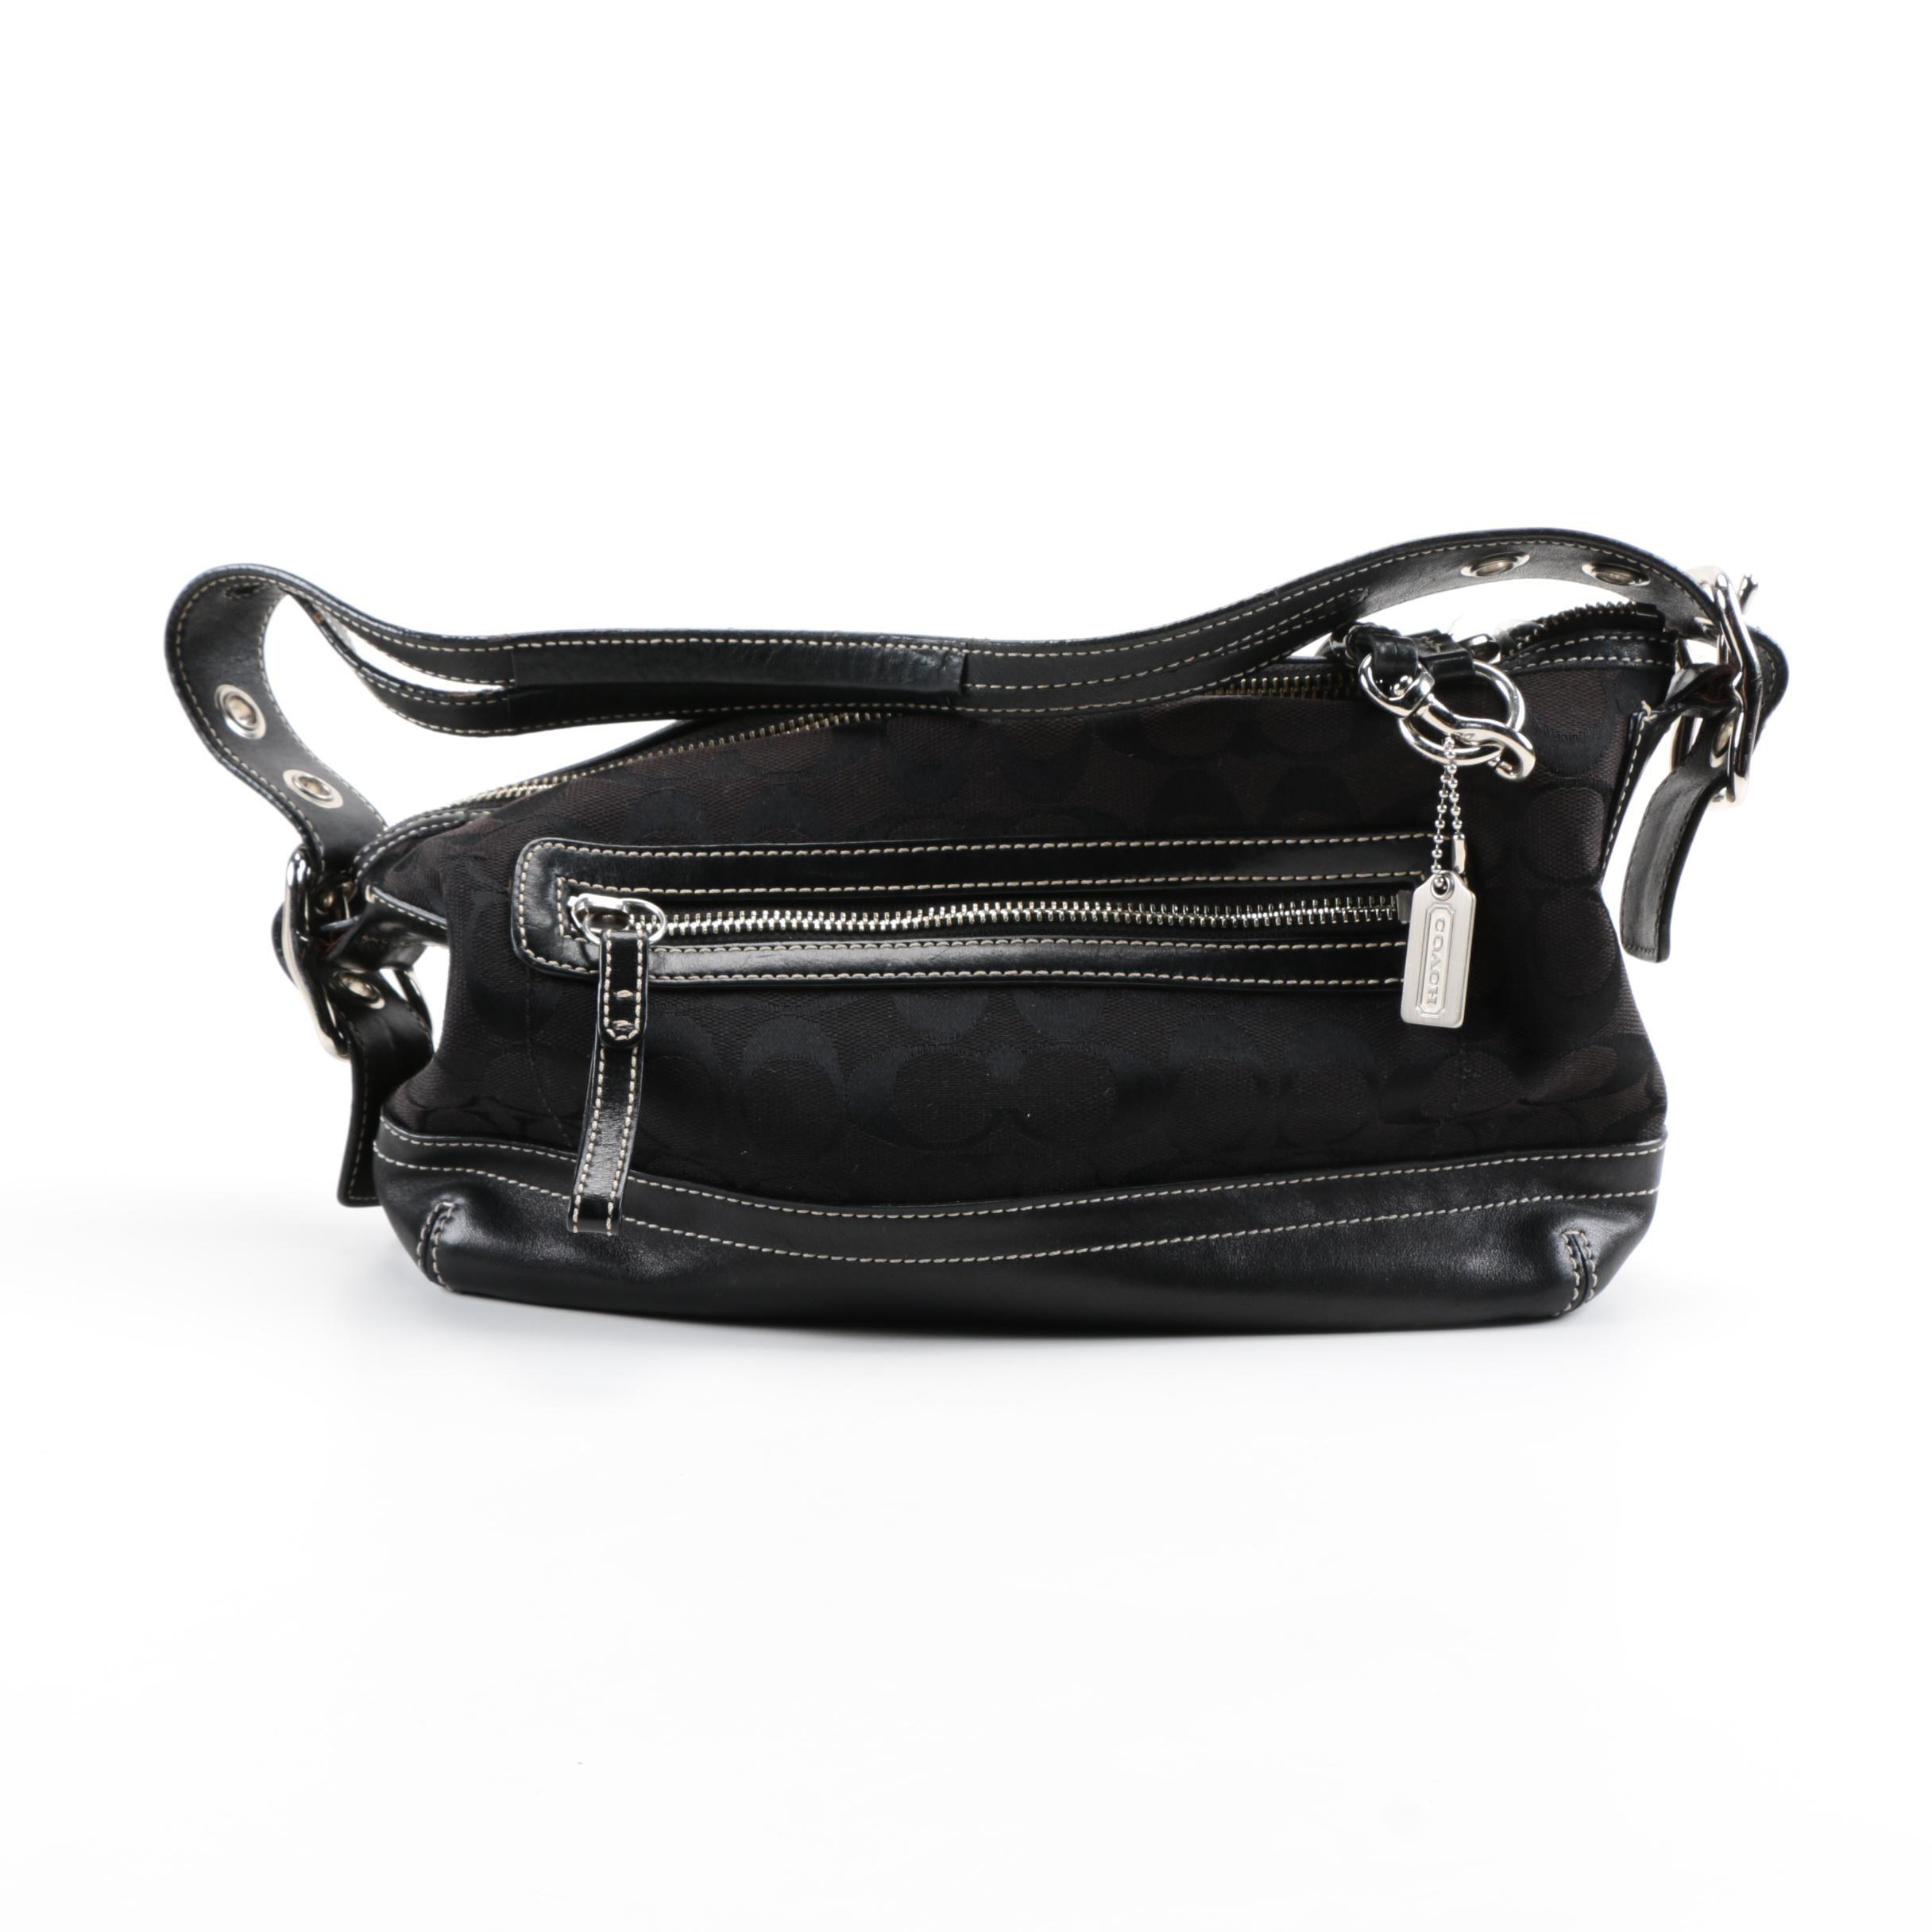 Coach Black Canvas and Leather Shoulder Bag